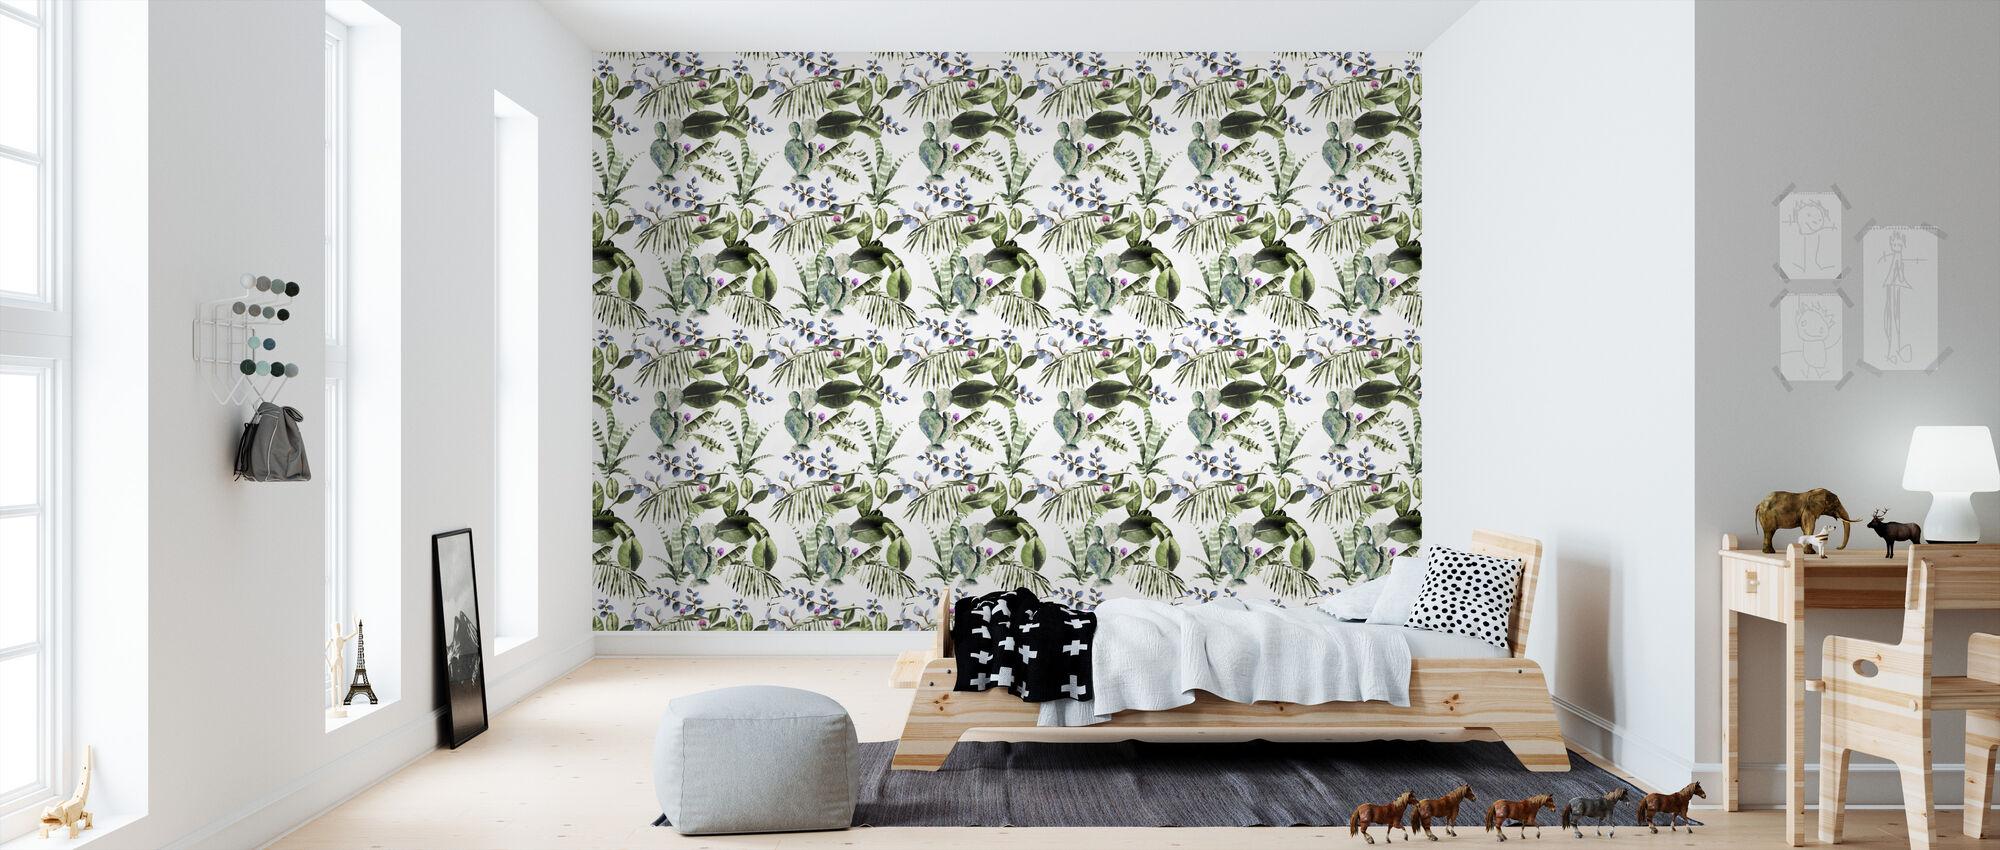 Cactus - Wallpaper - Kids Room